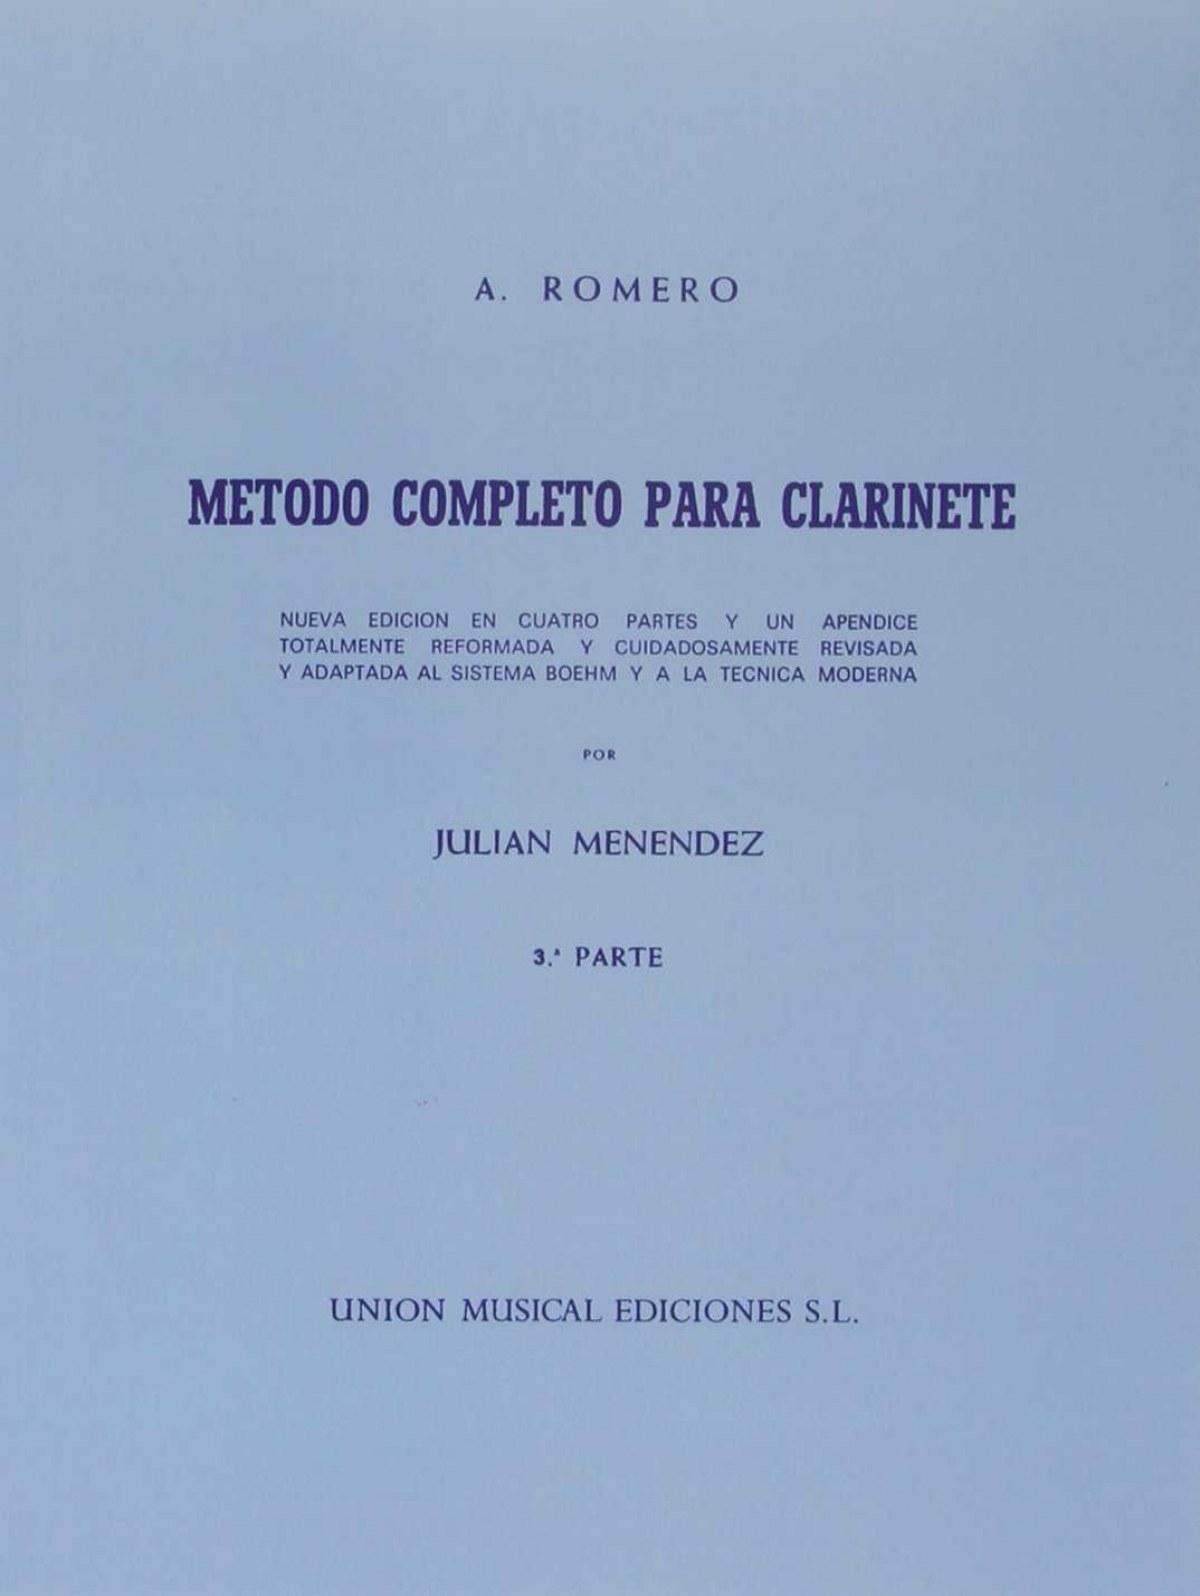 METODO COMPLETO PARA CLARINETE 3ºº PARTE JULIAN MENENDEZ